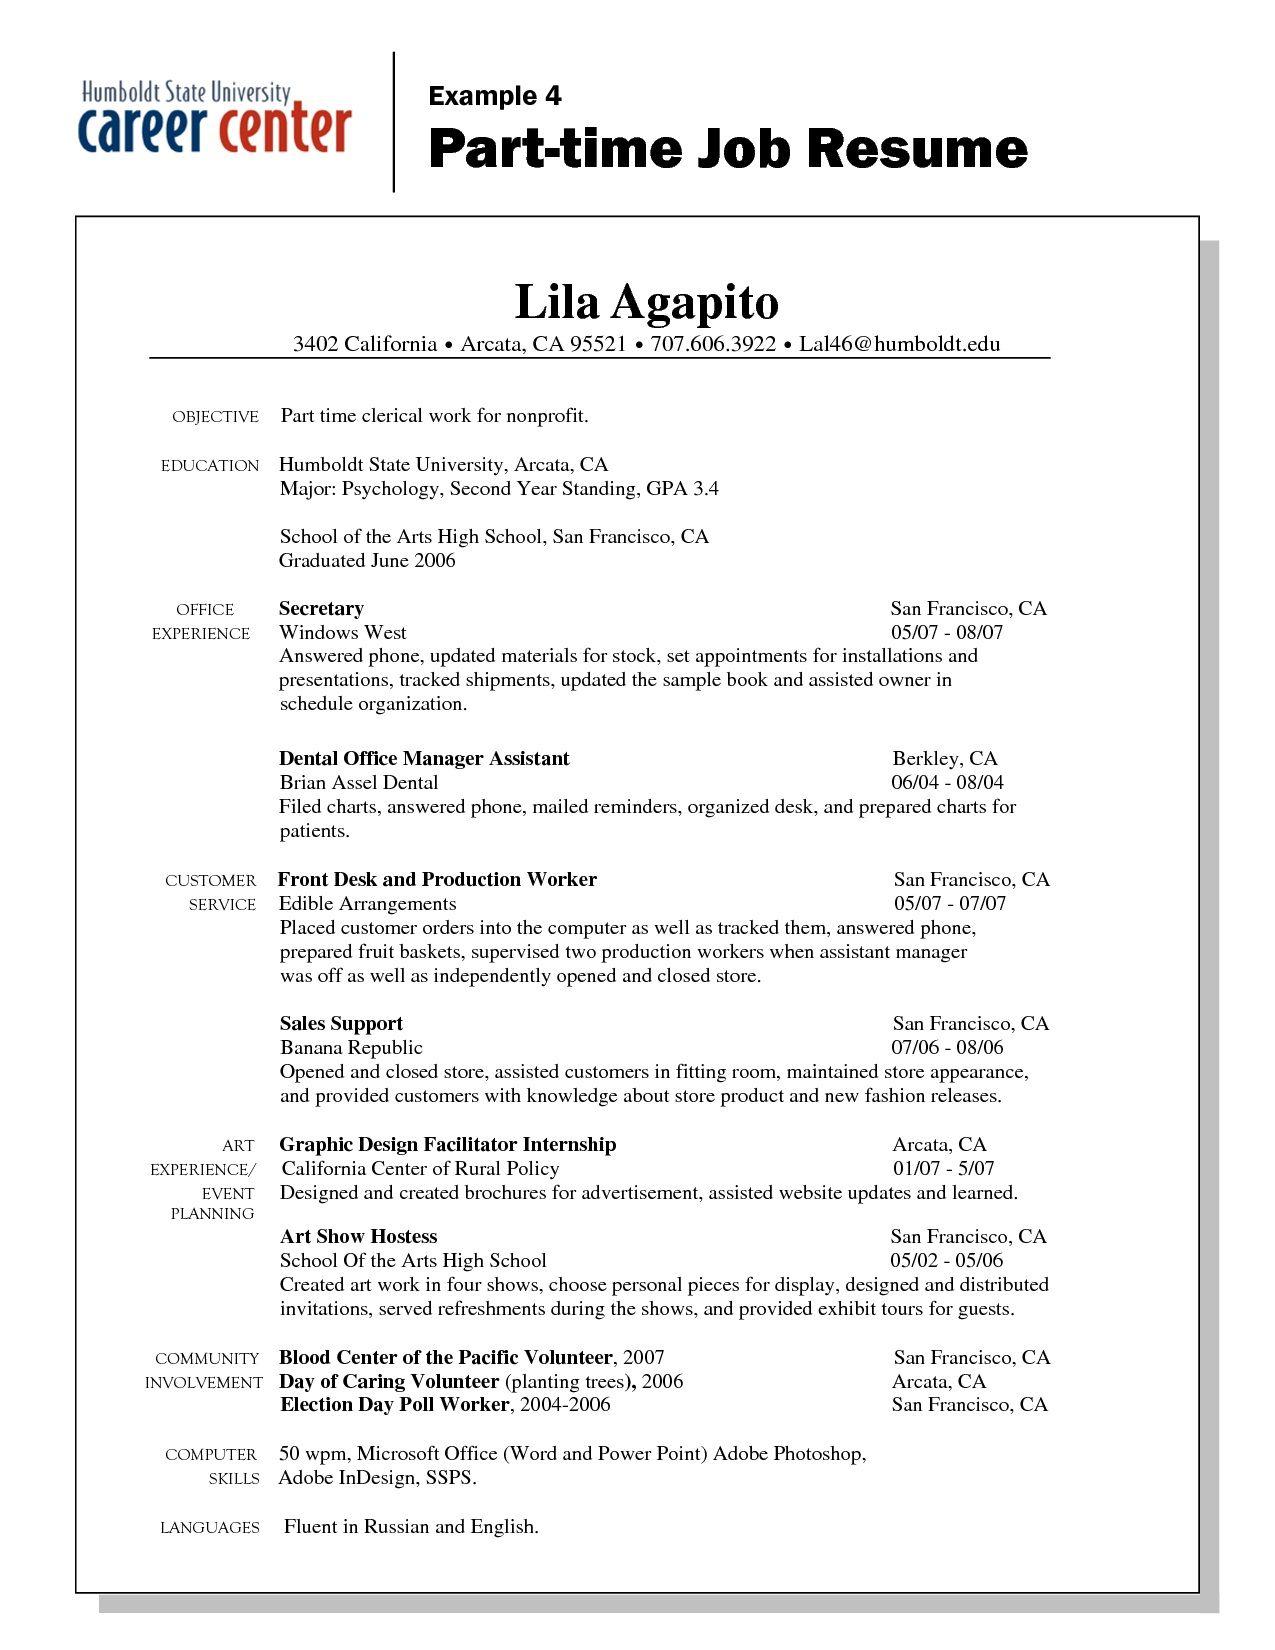 Job Part Time Resume Example #939 - http://topresume.info/2014/12/14 ...